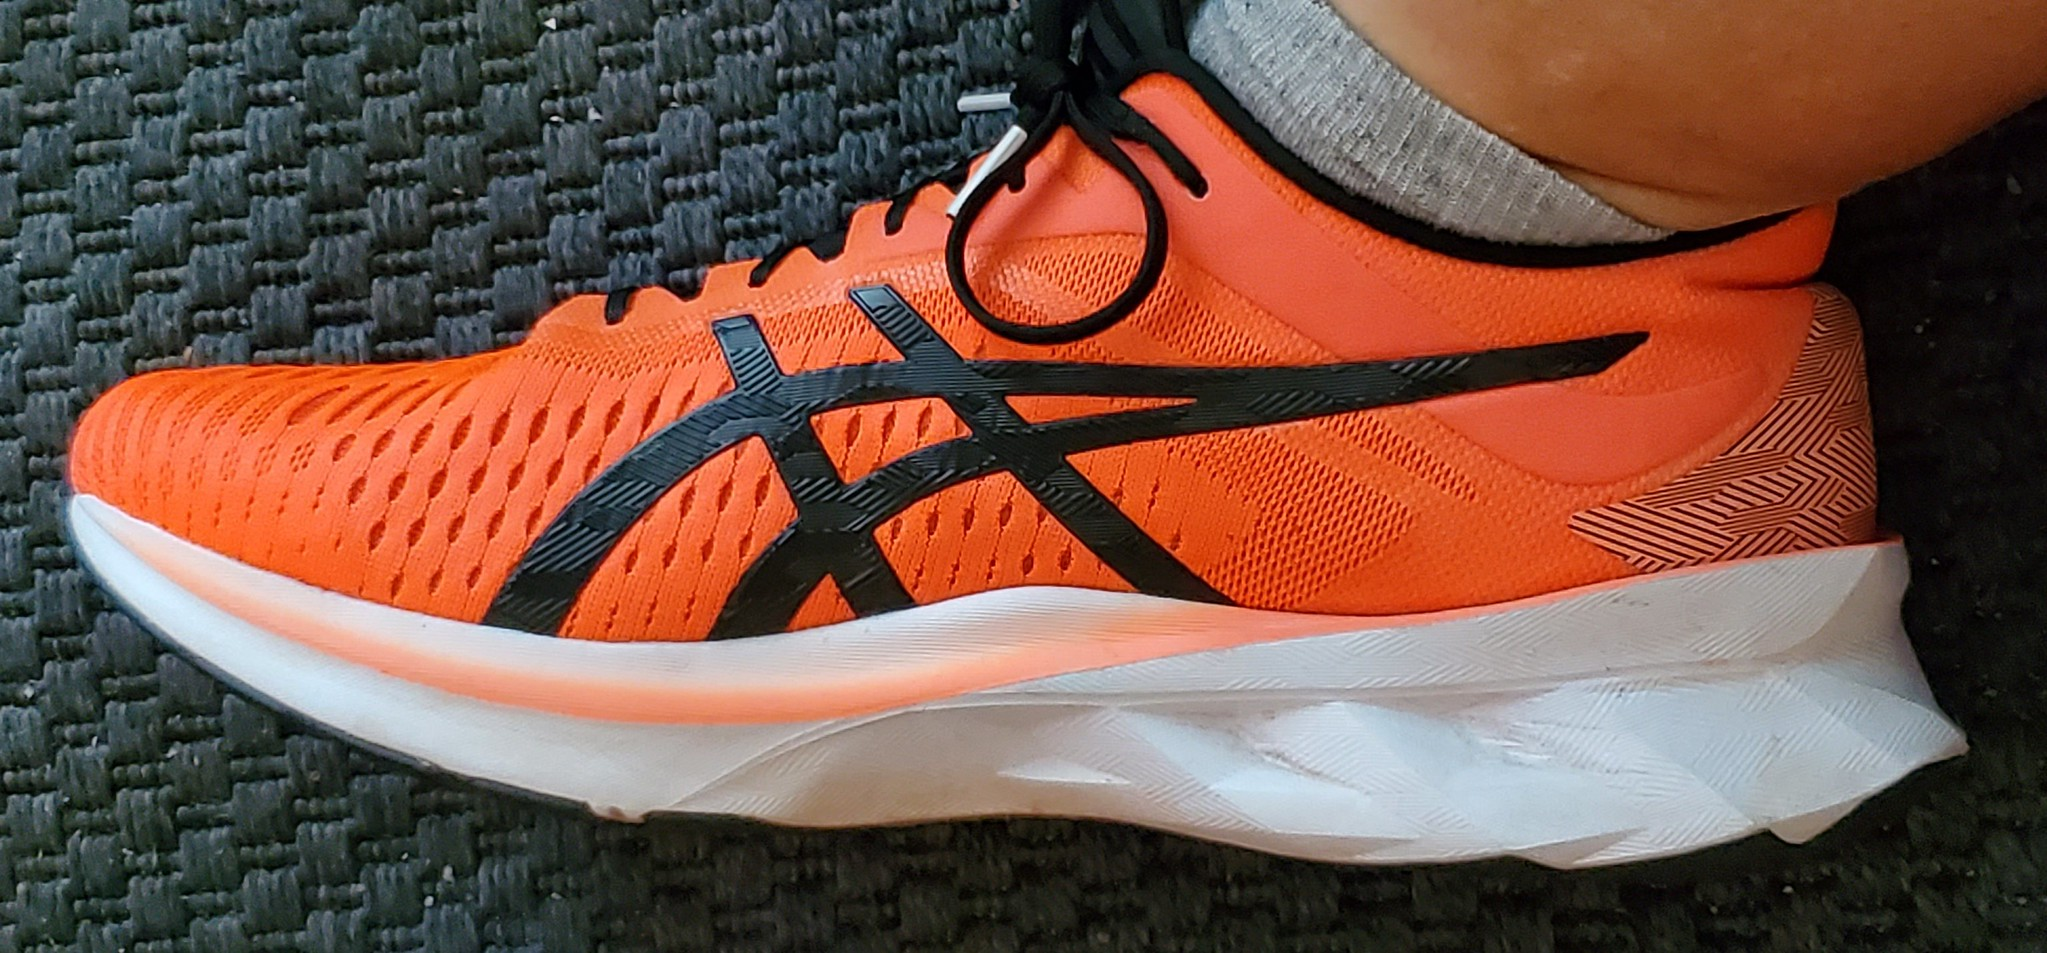 The Asics Novablast is an amazing walking shoe